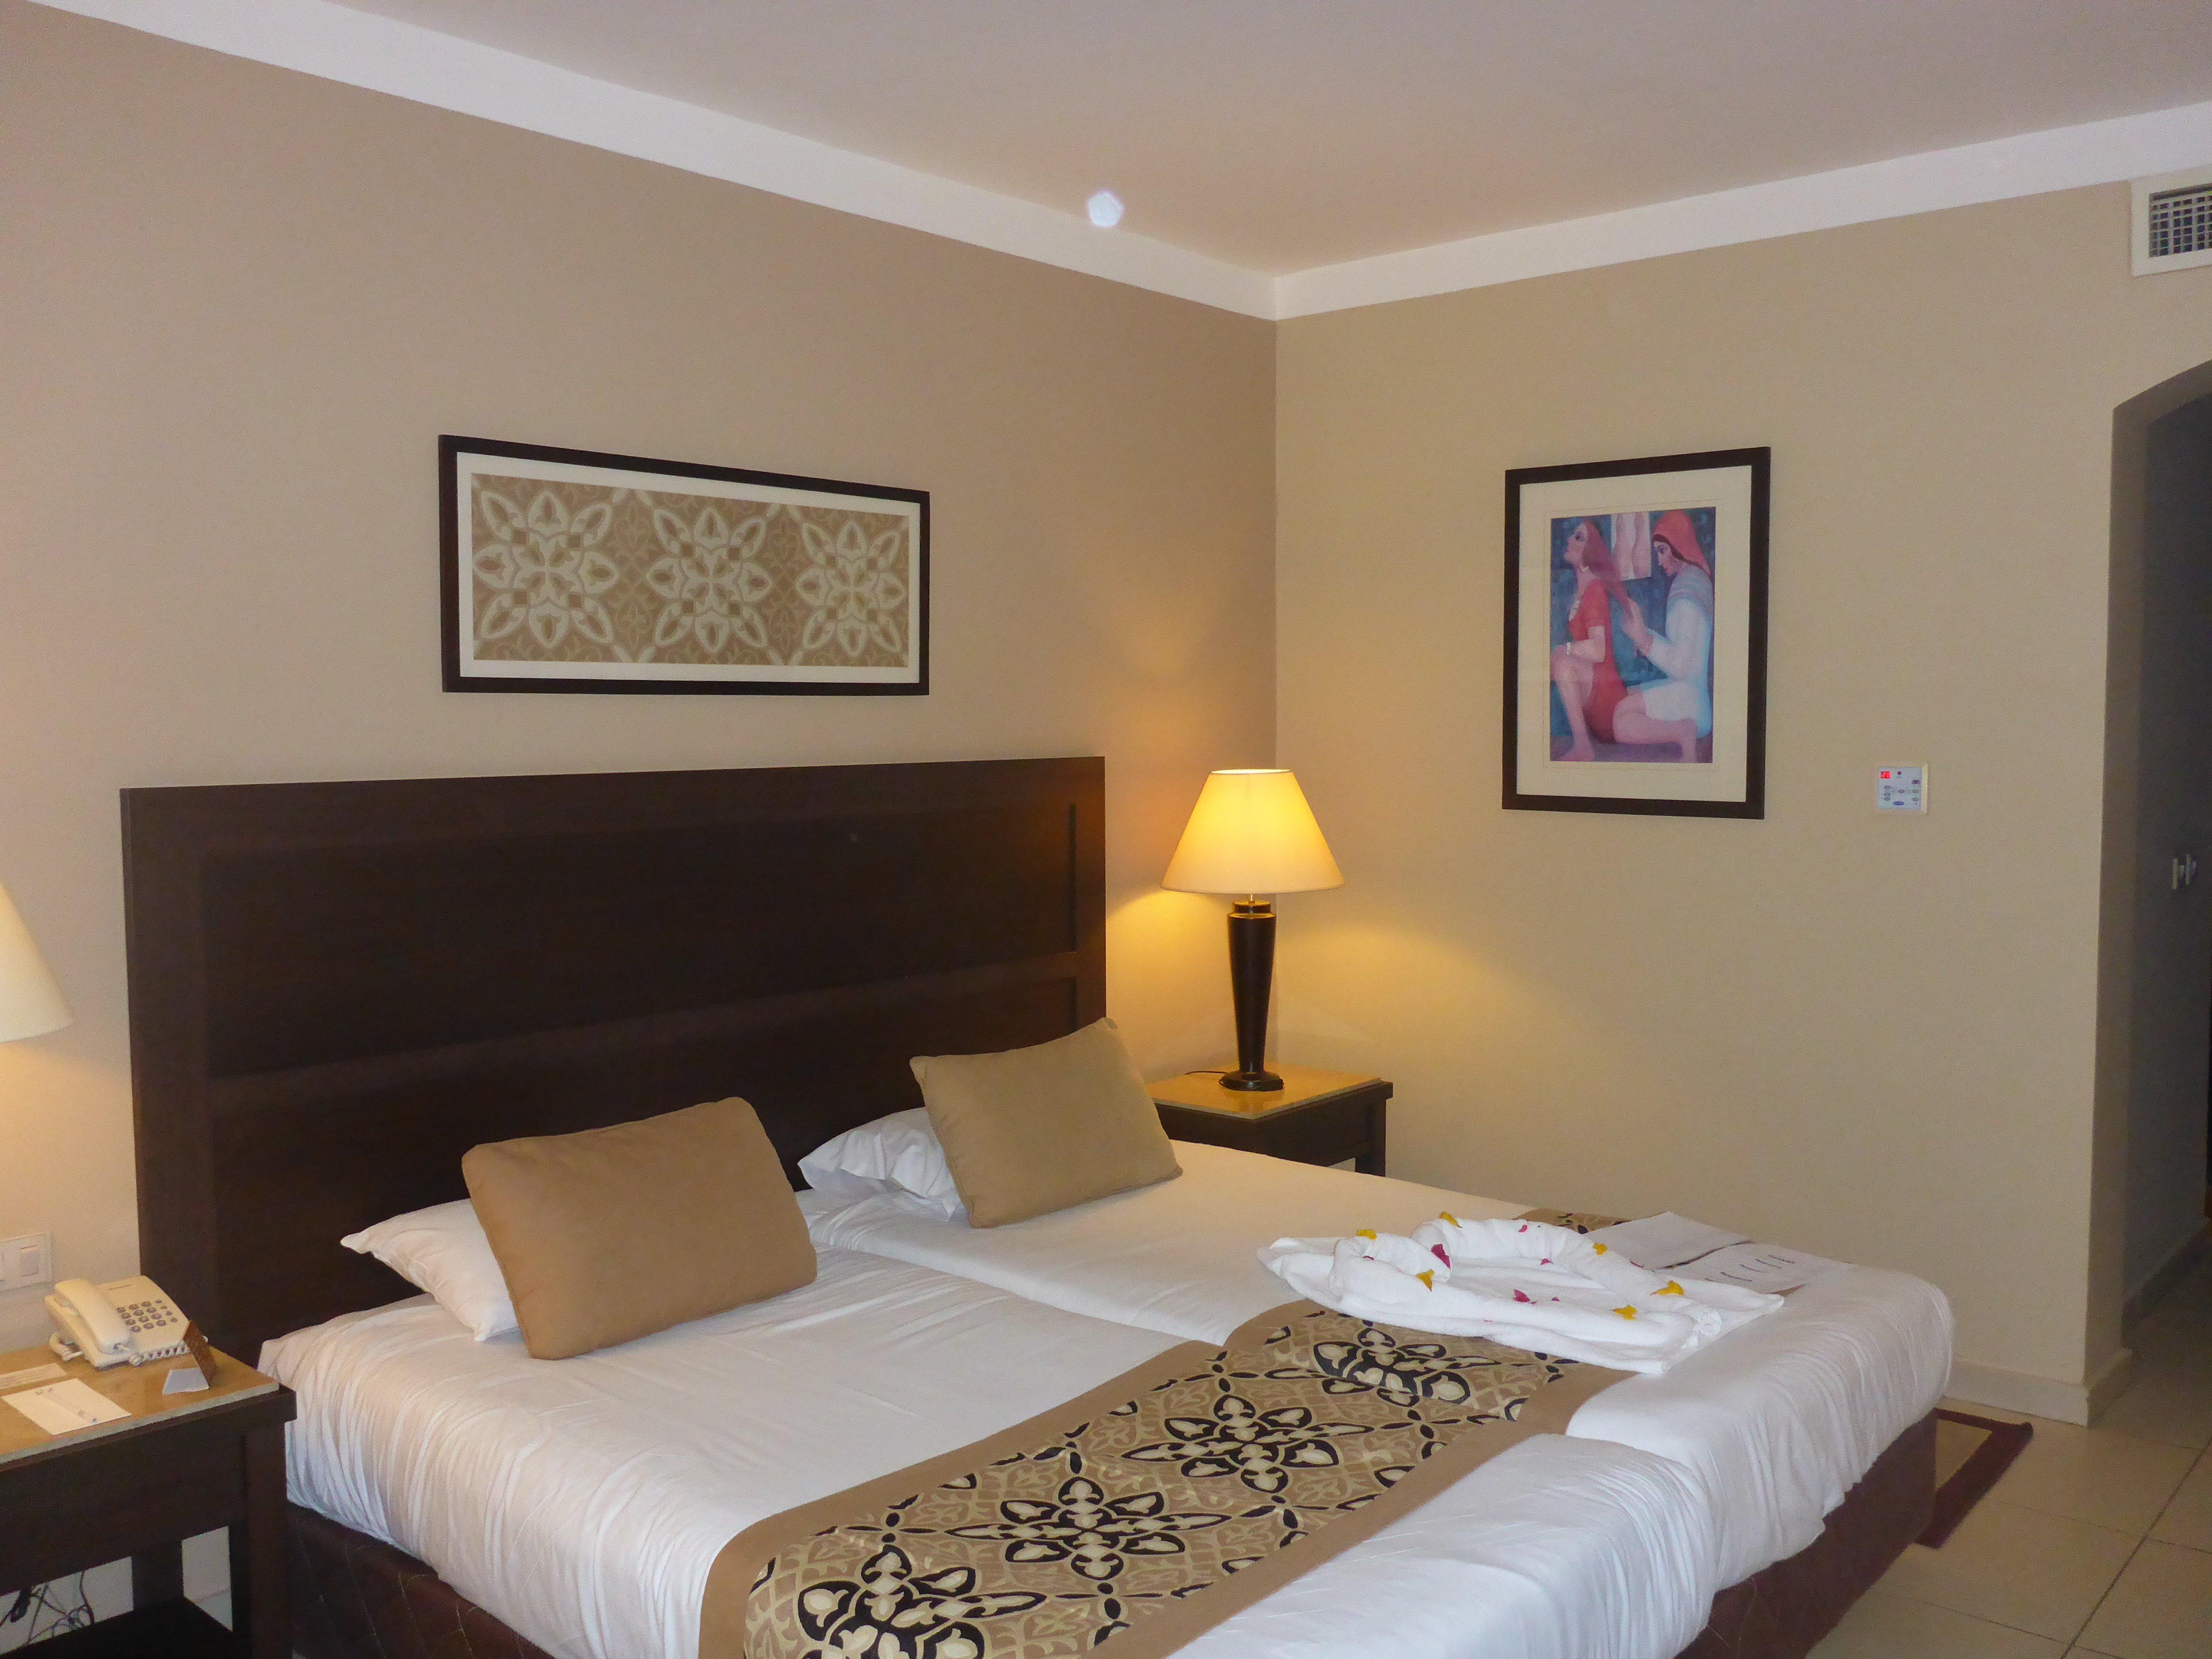 Onze hotelkamer in Jaz Dar El Madina